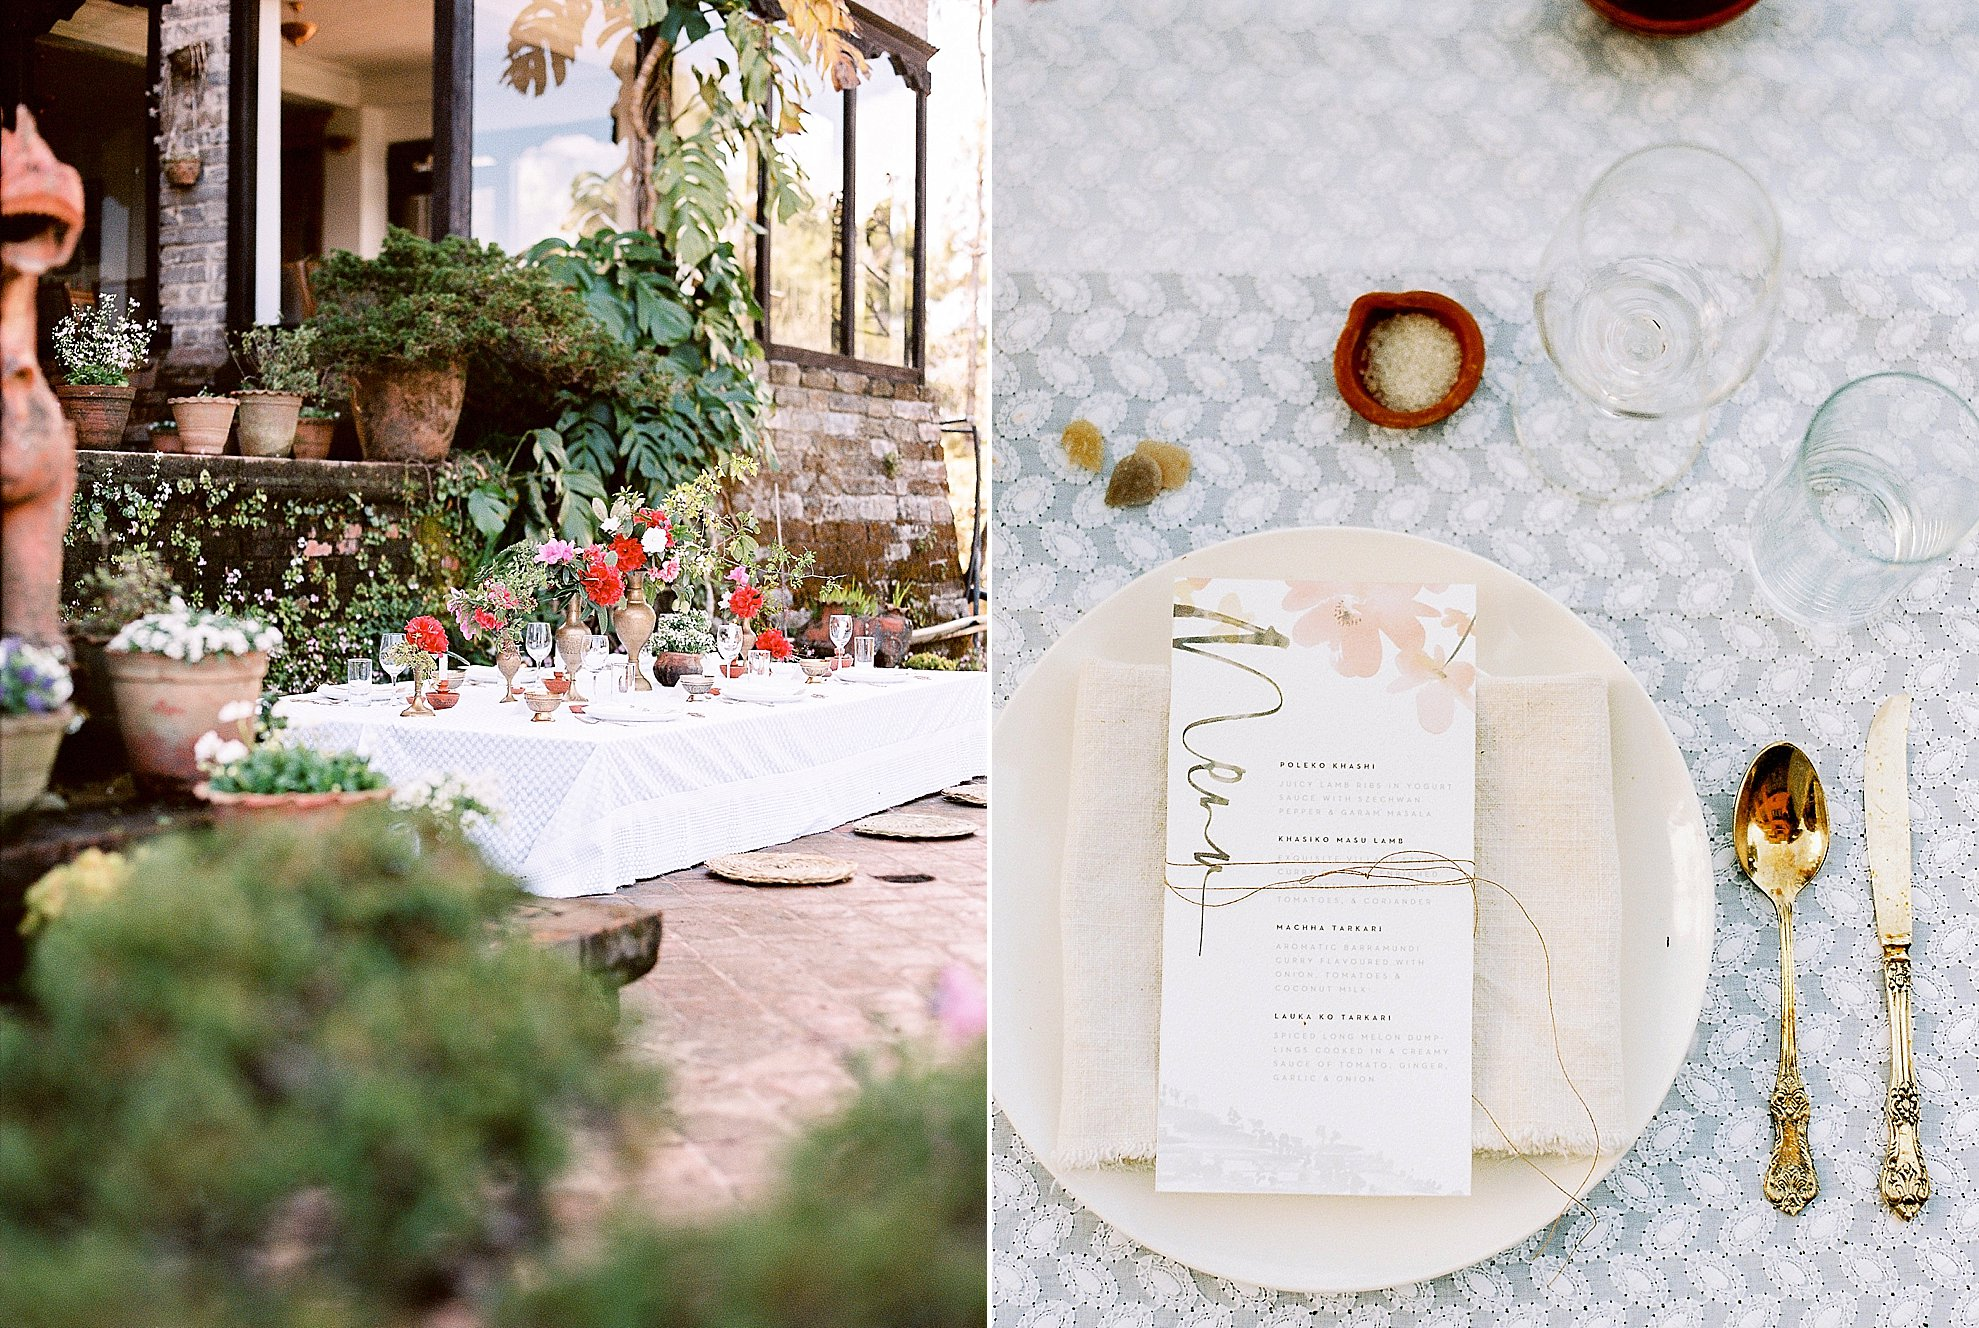 Bianca-Rijkenbarg-fotografie-for-this-romance-bruidsinspiratie-blog_0008